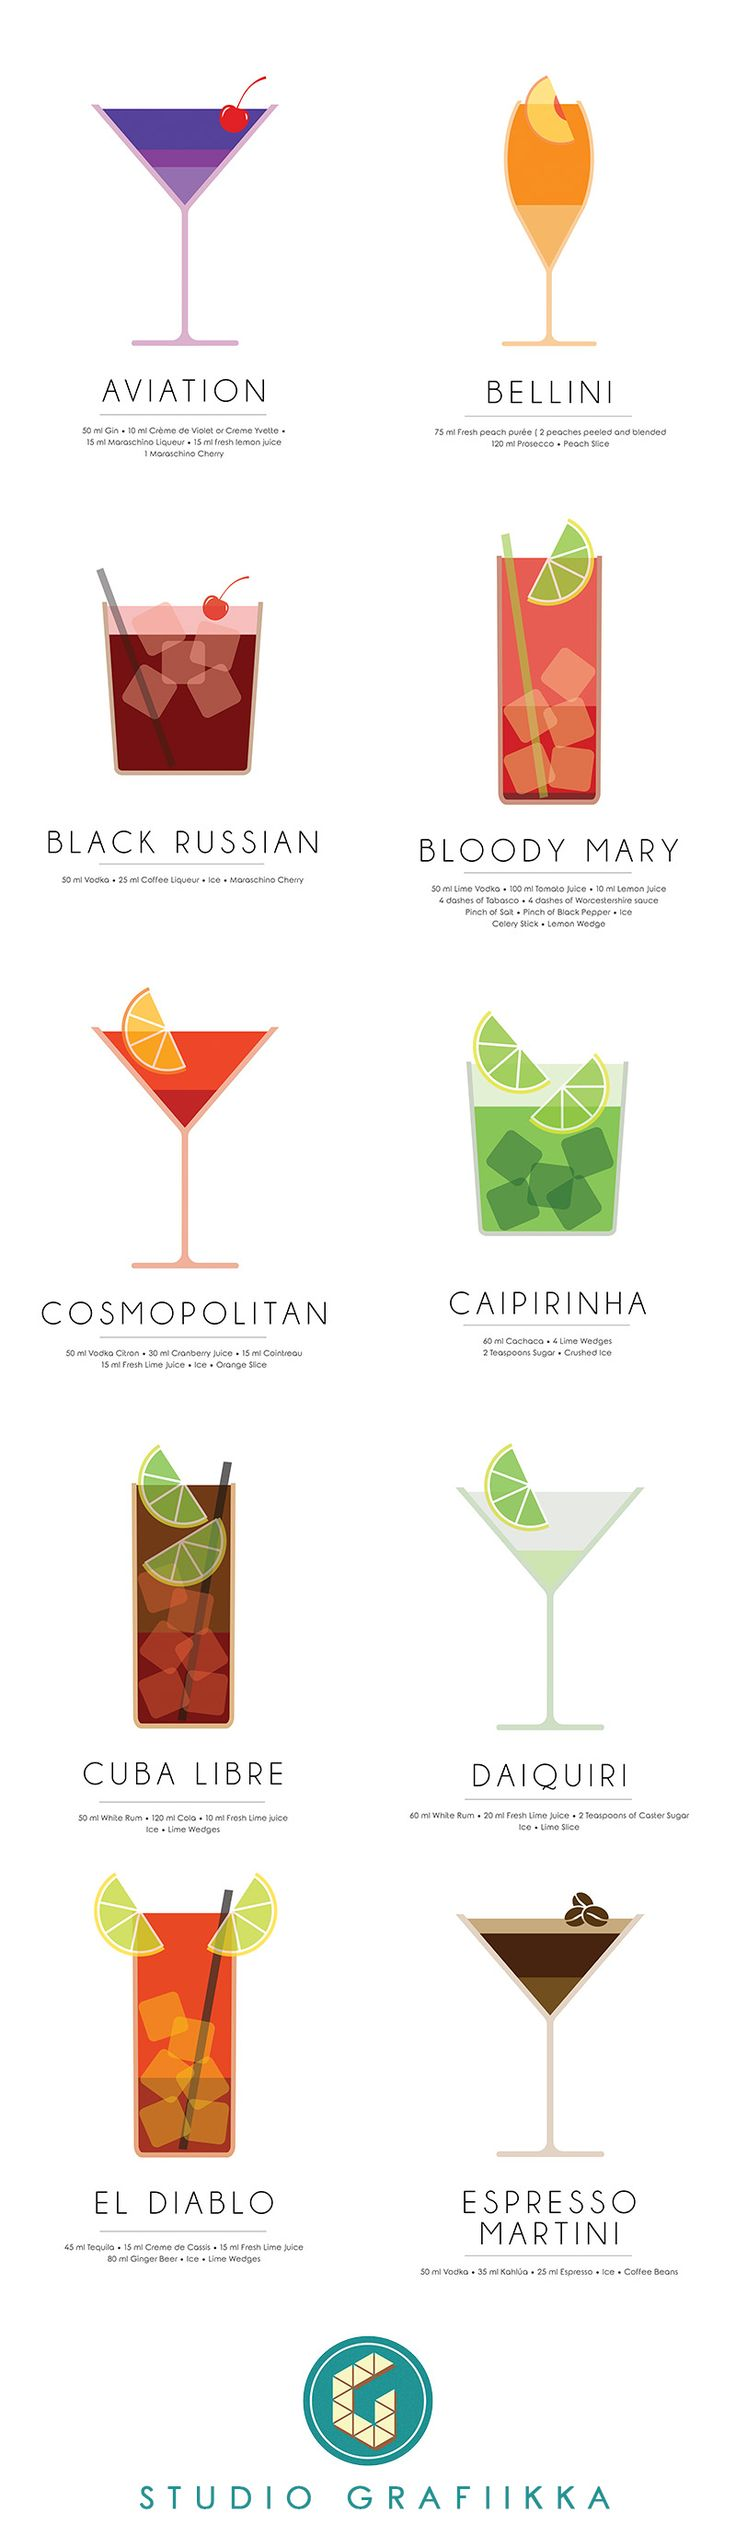 Minimalist Cocktail Illustrations Vol-1, by designer Sreejith V, Studio Grafiikka.